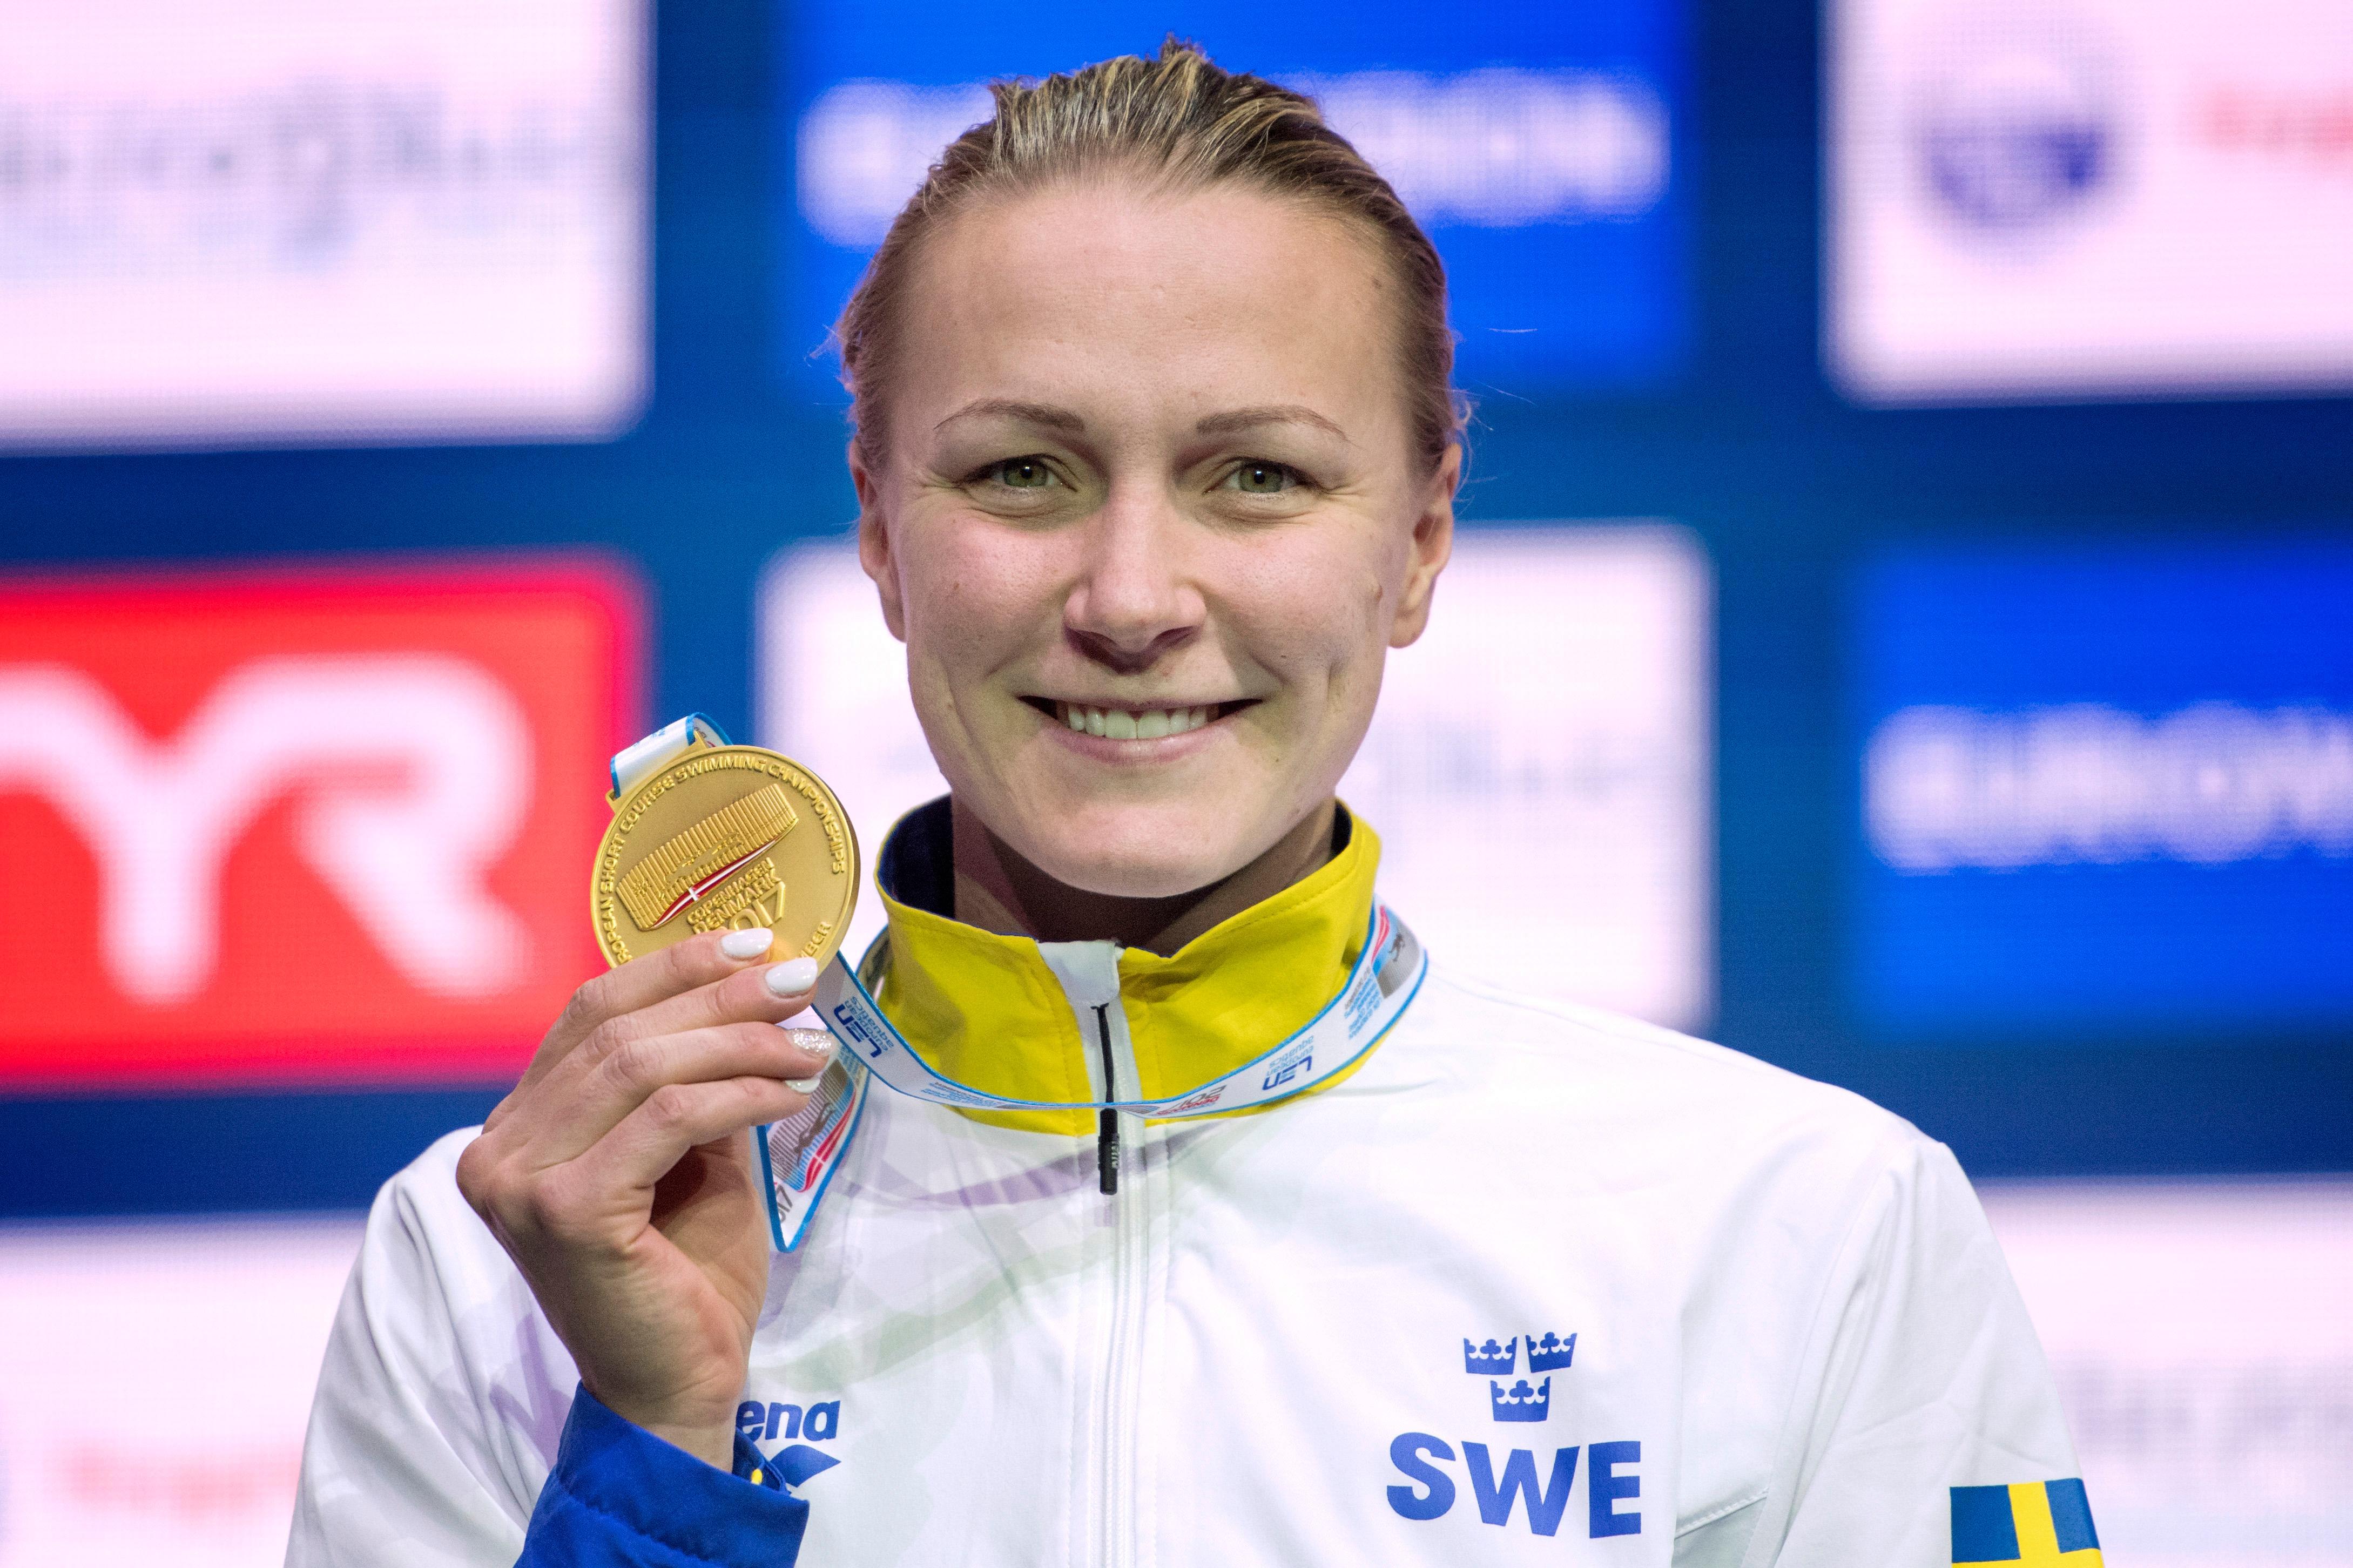 Sjostrom tog historisk medalj